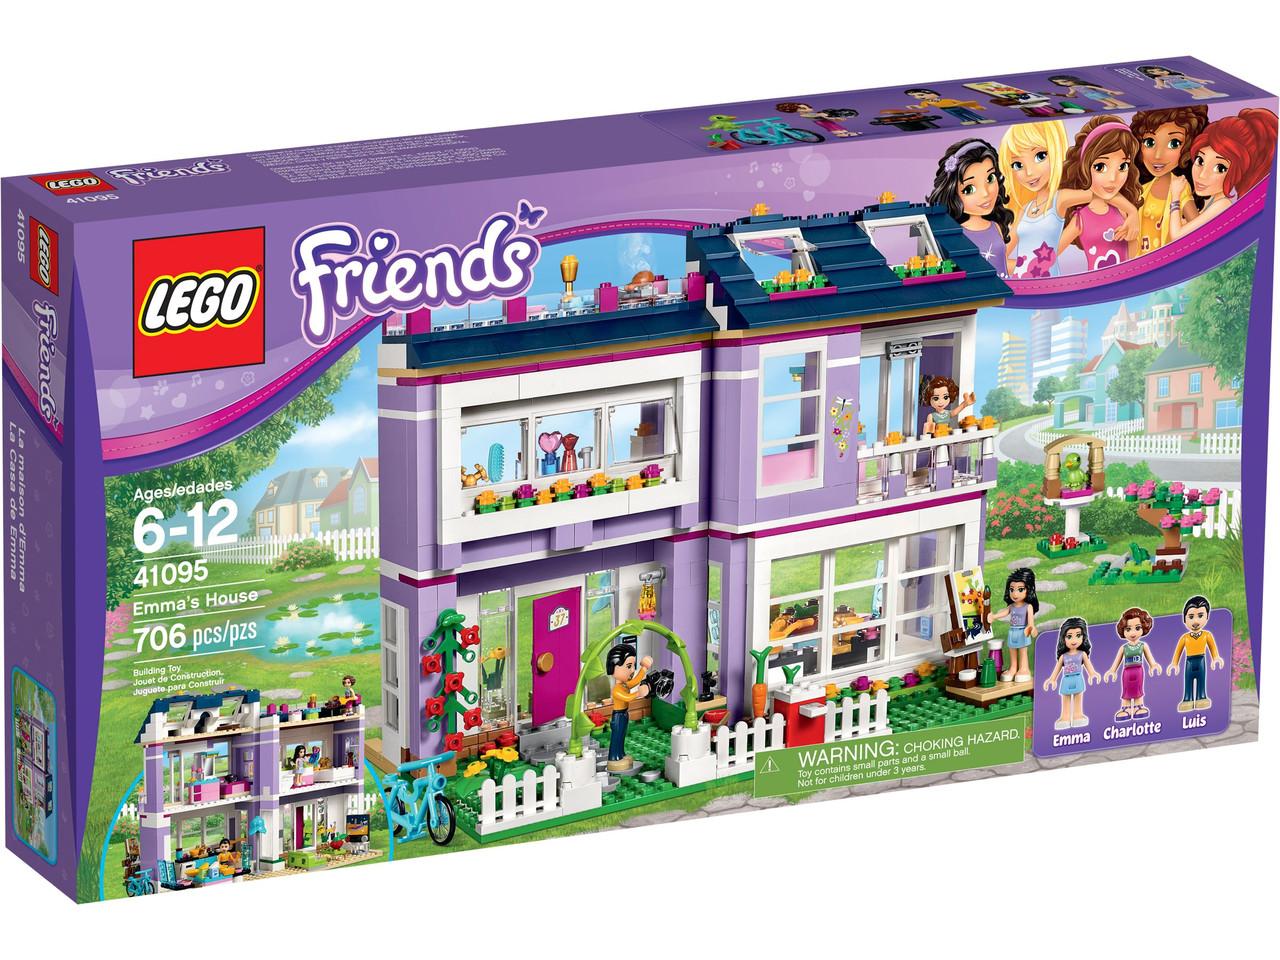 LEGO Friends -  Будиночок Емми (41095) Домик Эммы